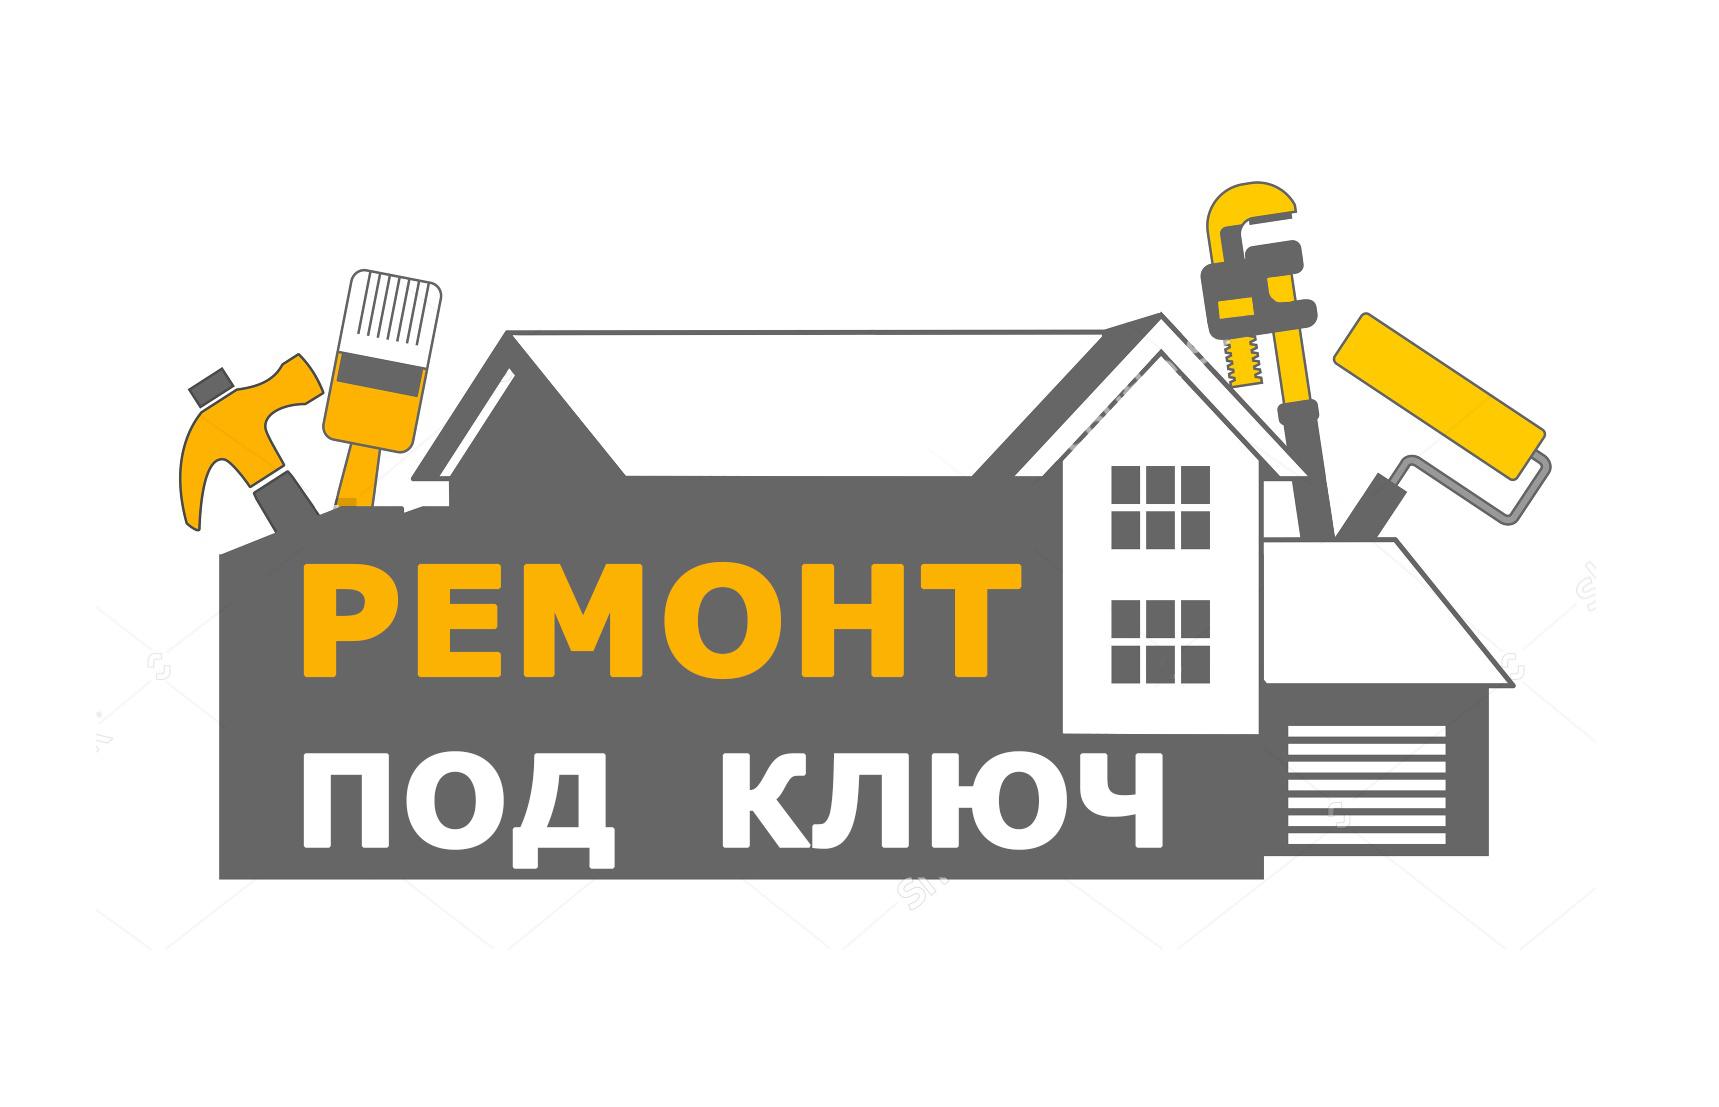 РЕМОНТ КВАРТИР ПОД КЛЮЧ, капитальный ремонт квартир